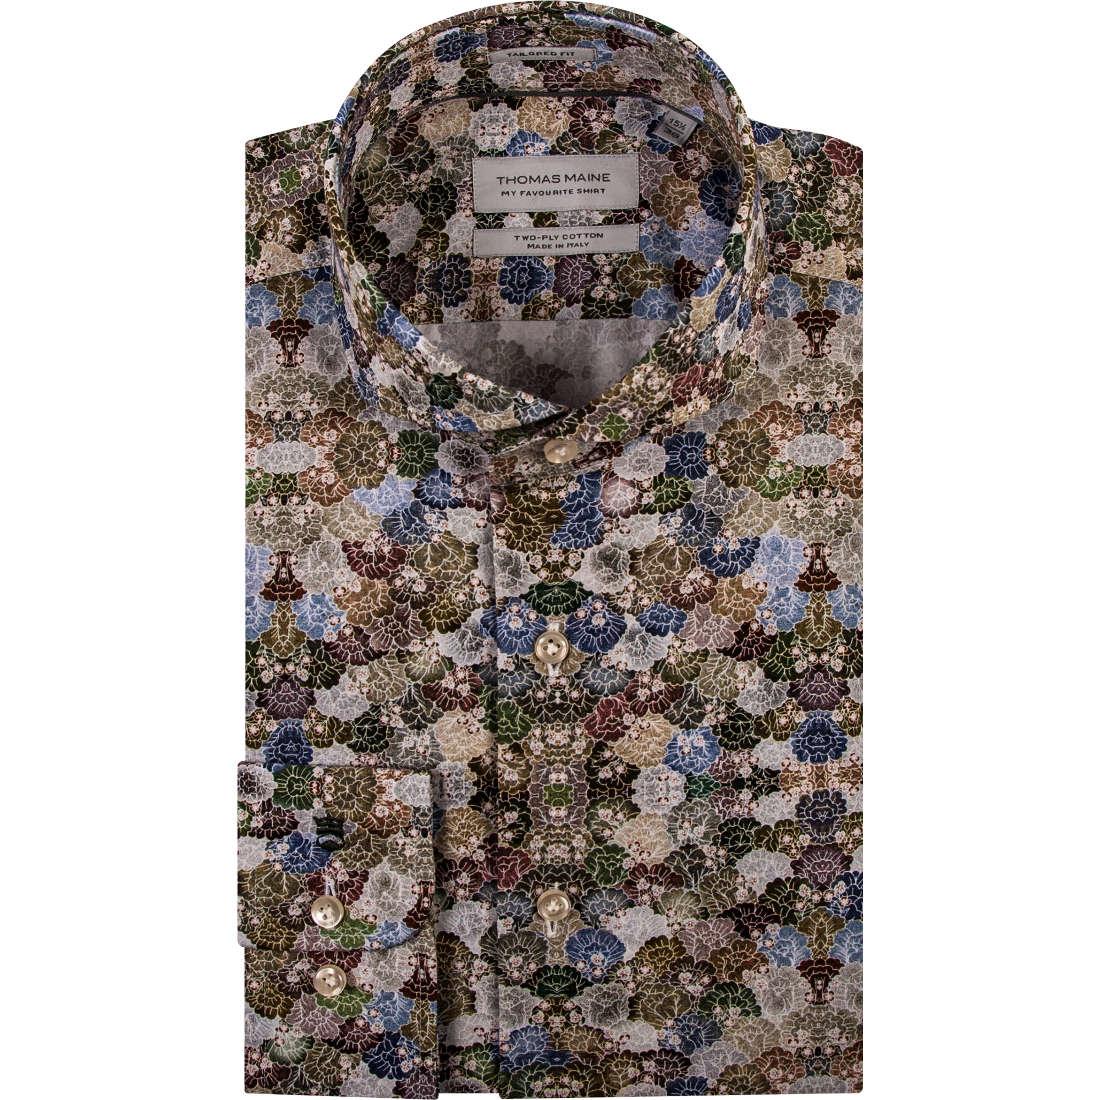 Thomas Maine overhemd Tailored Fit 91-7769 in het Groen